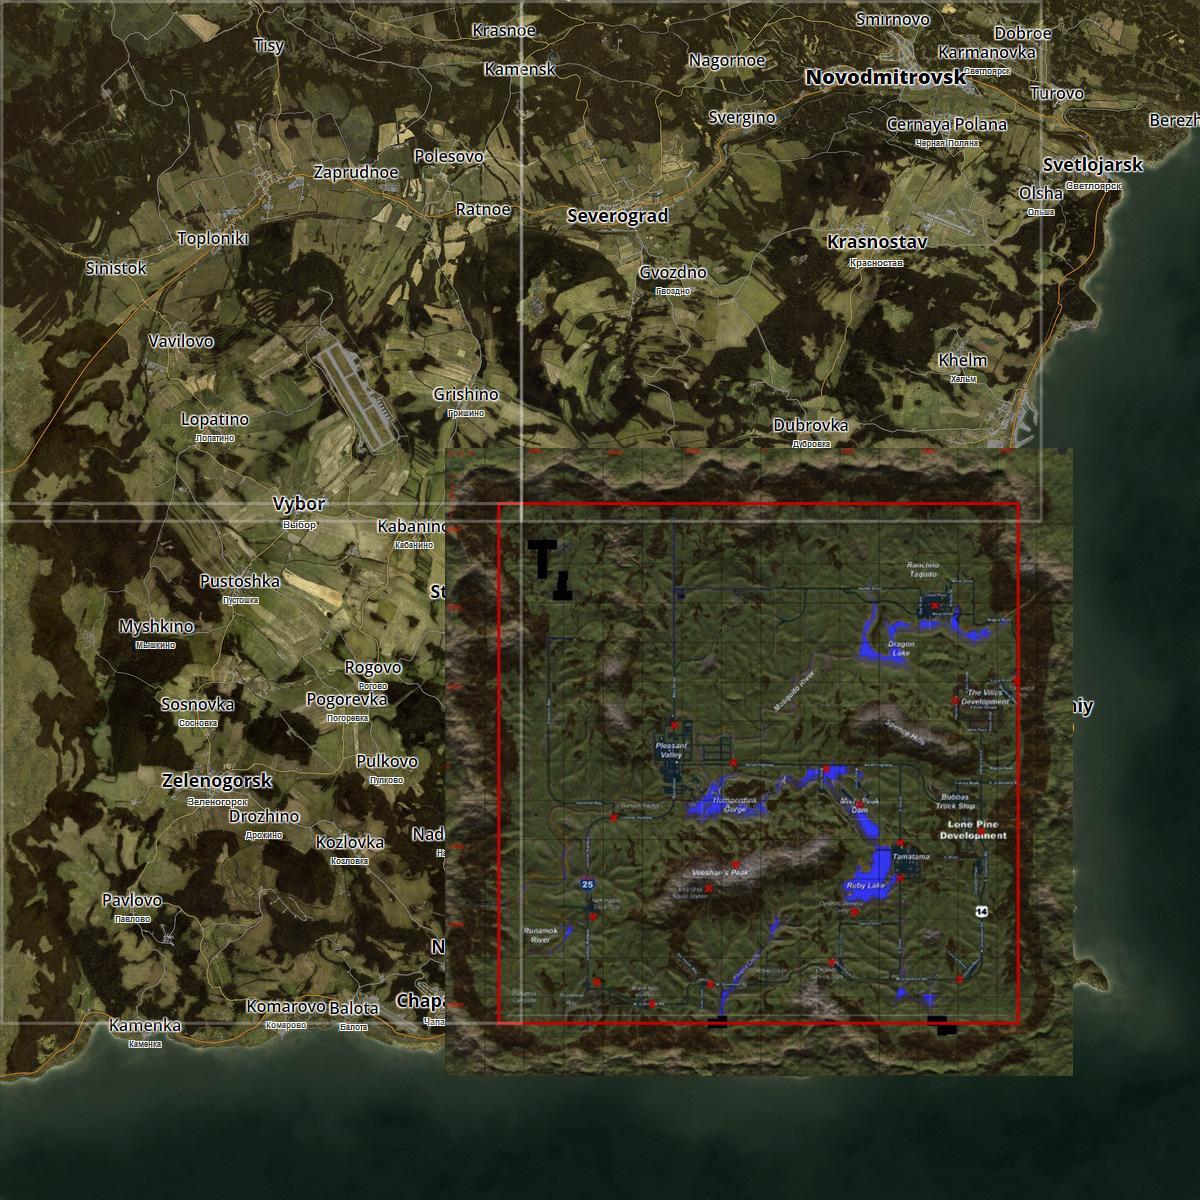 dayz map size - Ayla.quiztrivia.co